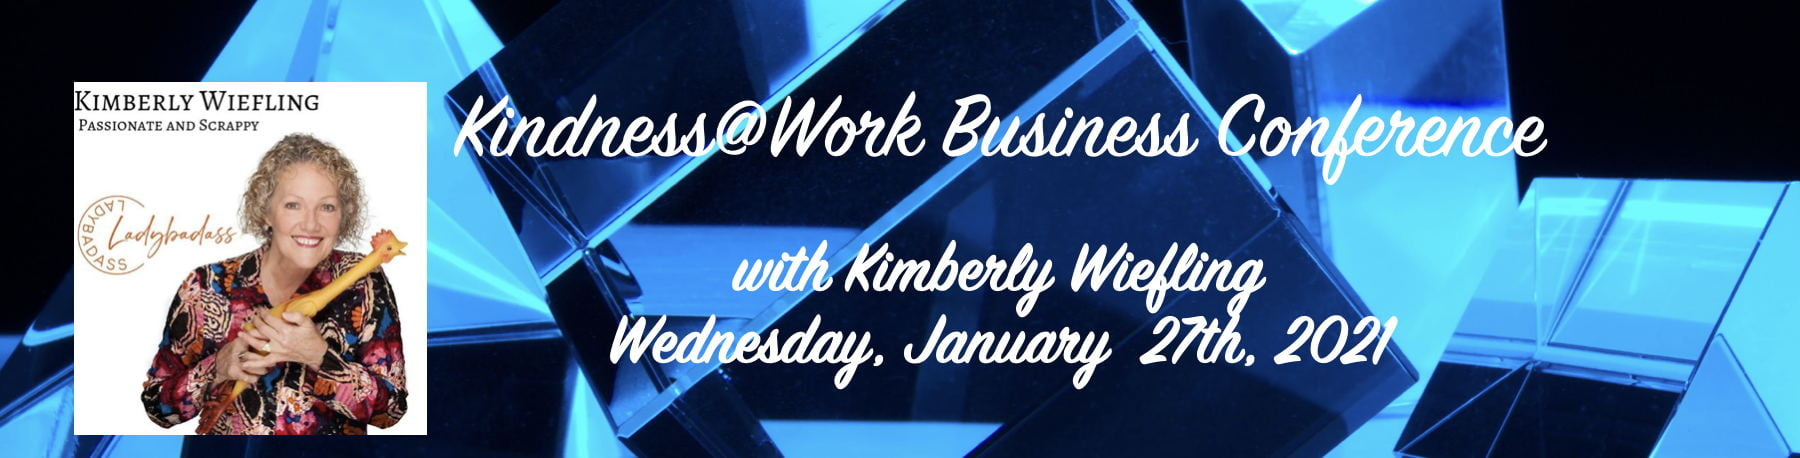 Kindness Keynote Speaker Kimberly Wiefling